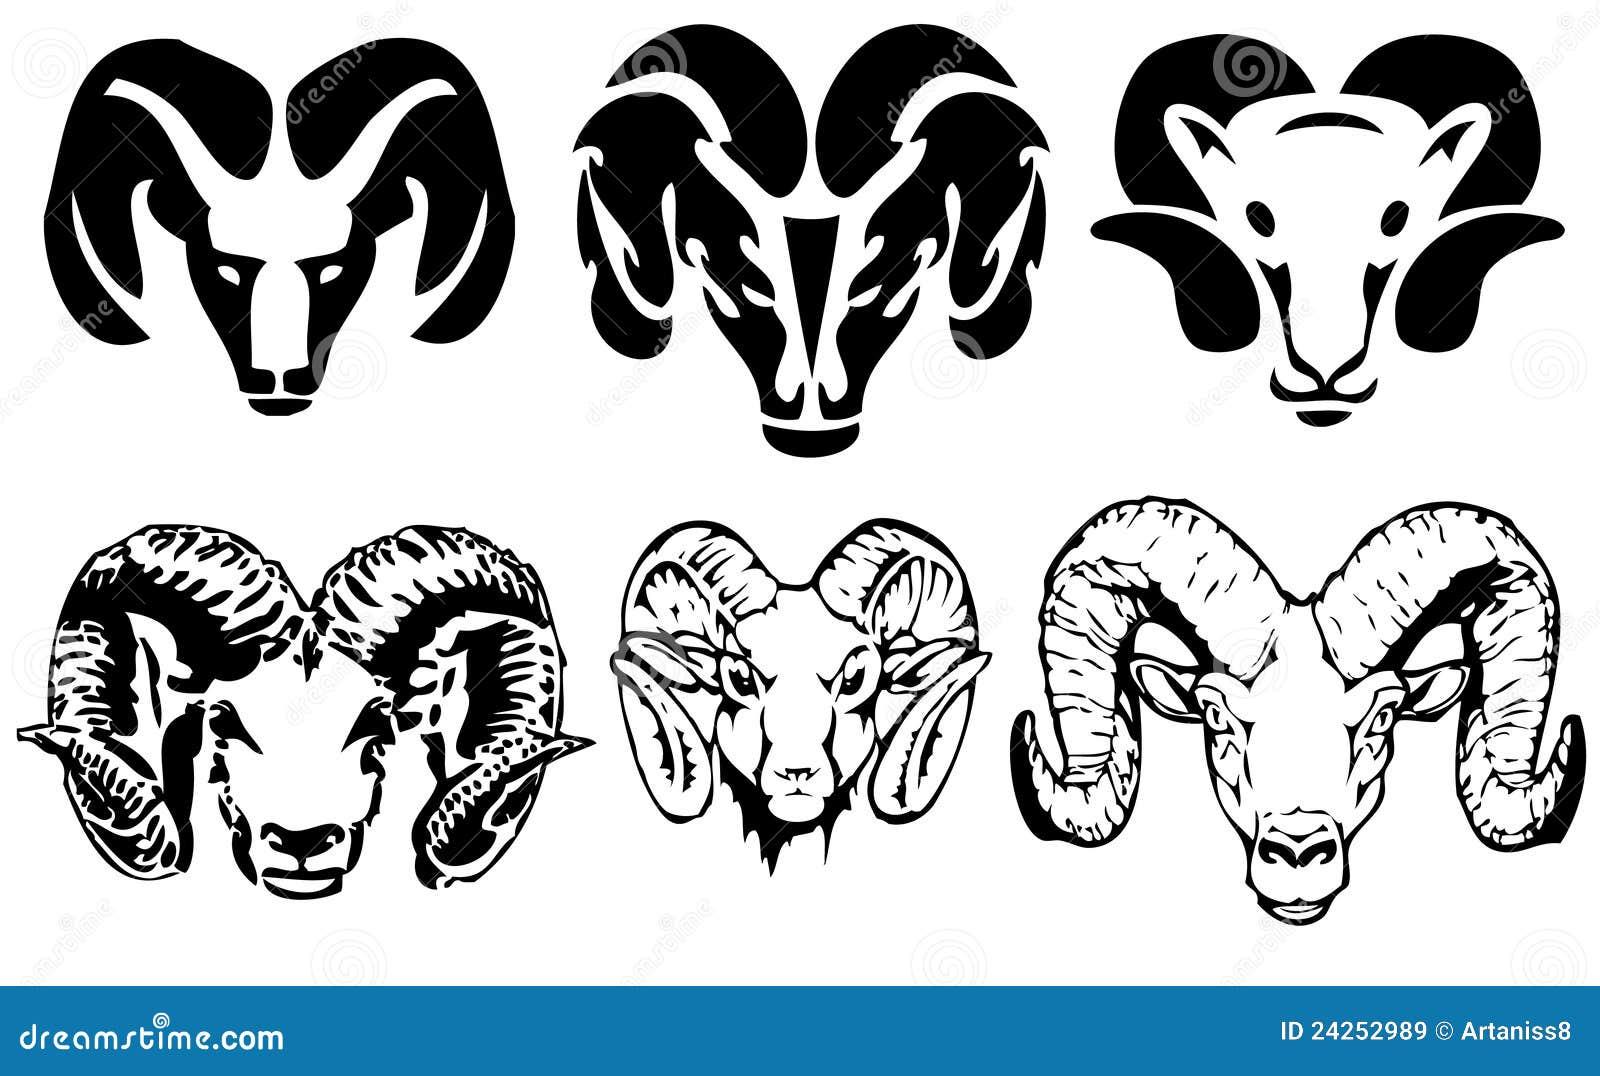 Ram stencil - Vector set